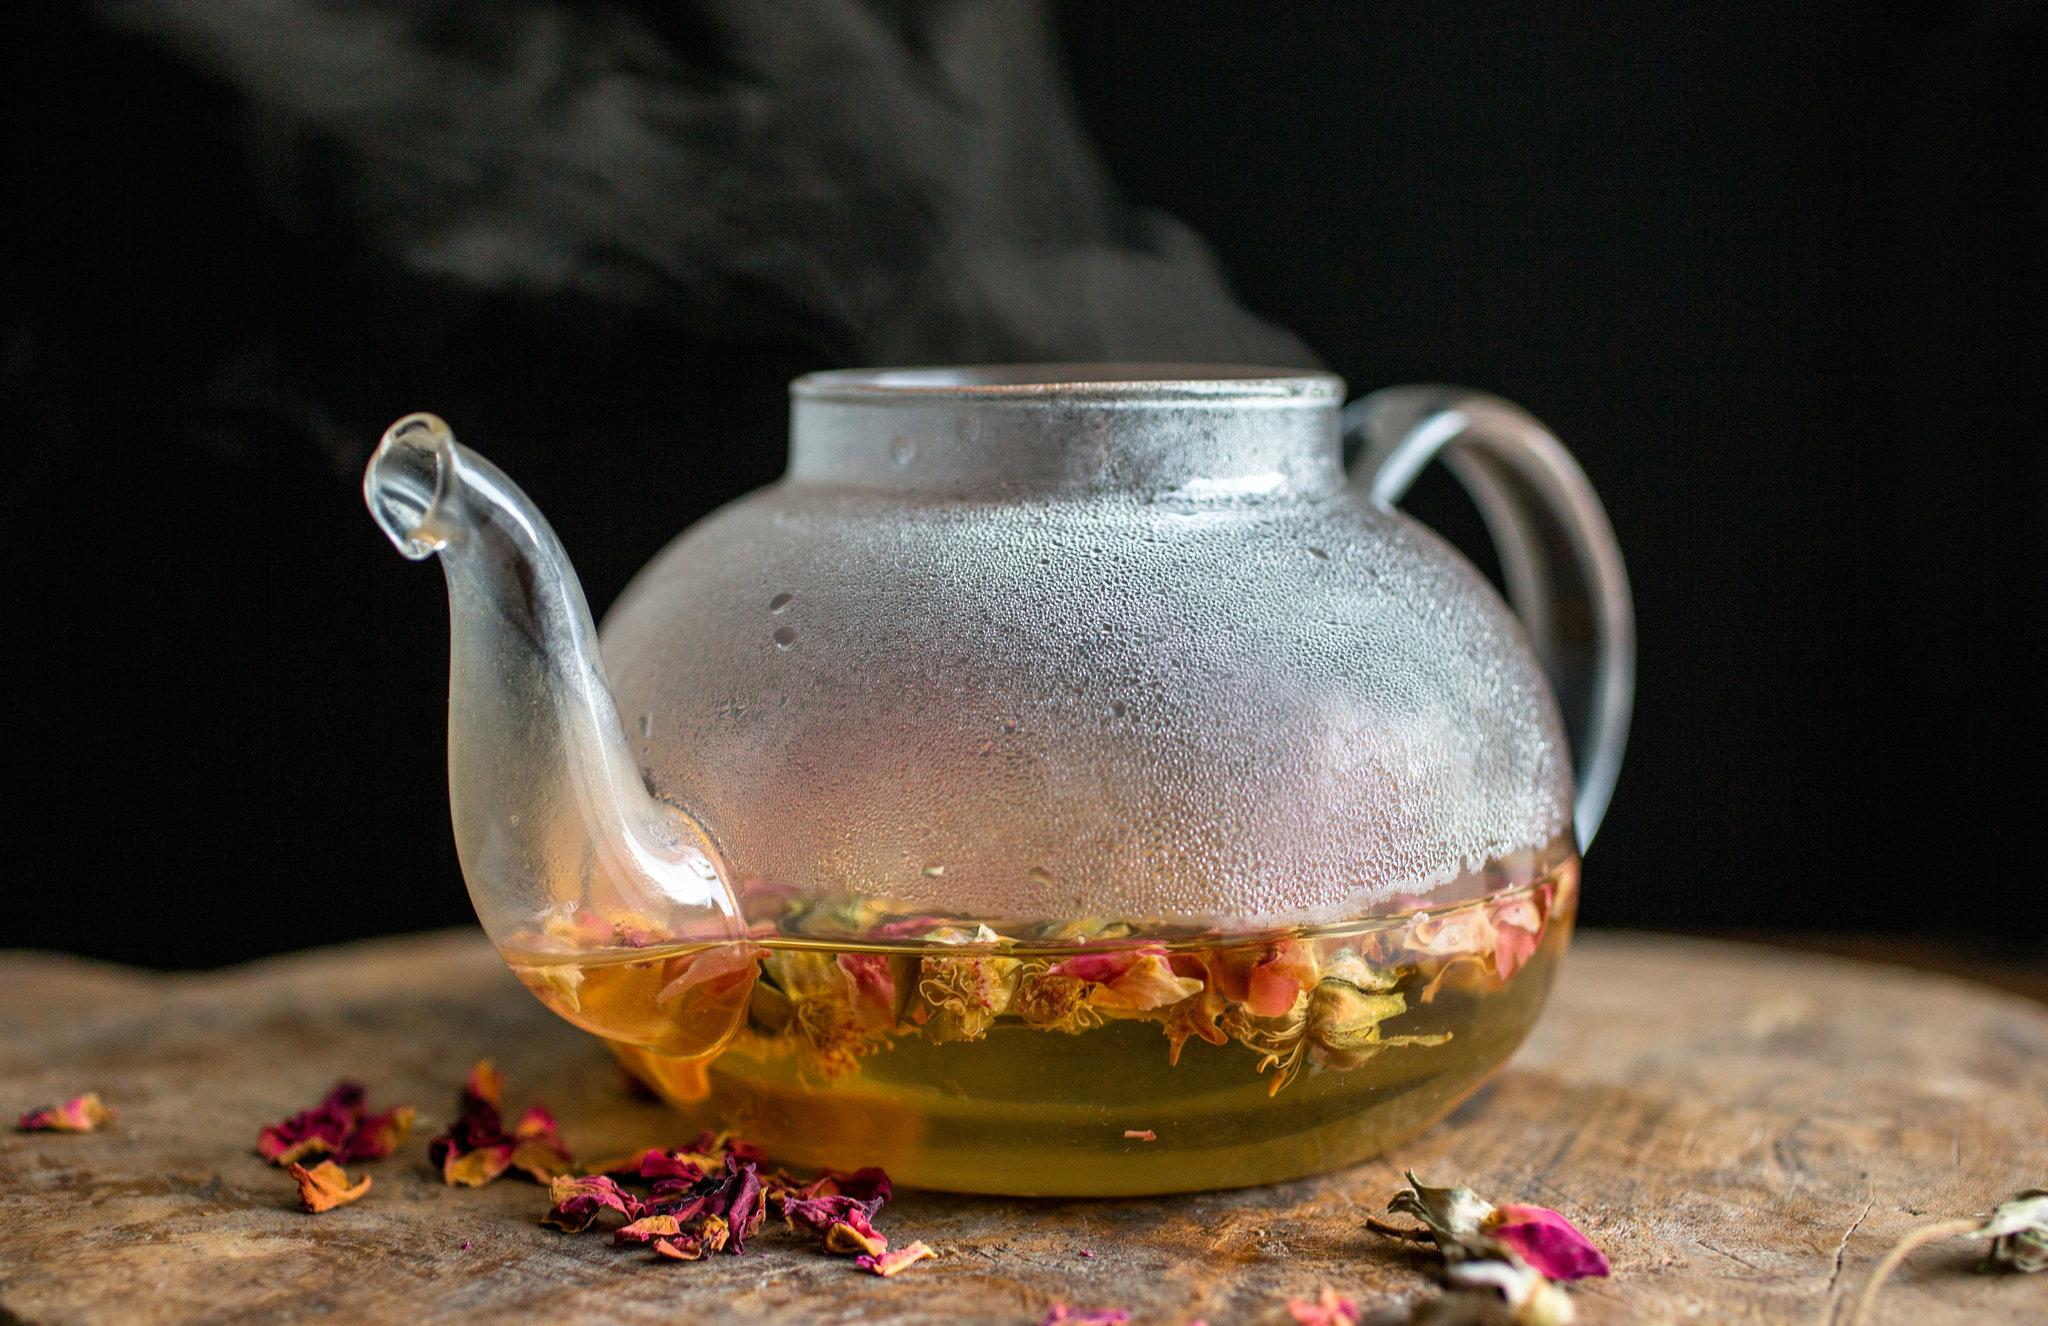 Rose Petal Tea HD Wallpapers | Backgrounds - Wallpaper Abyss